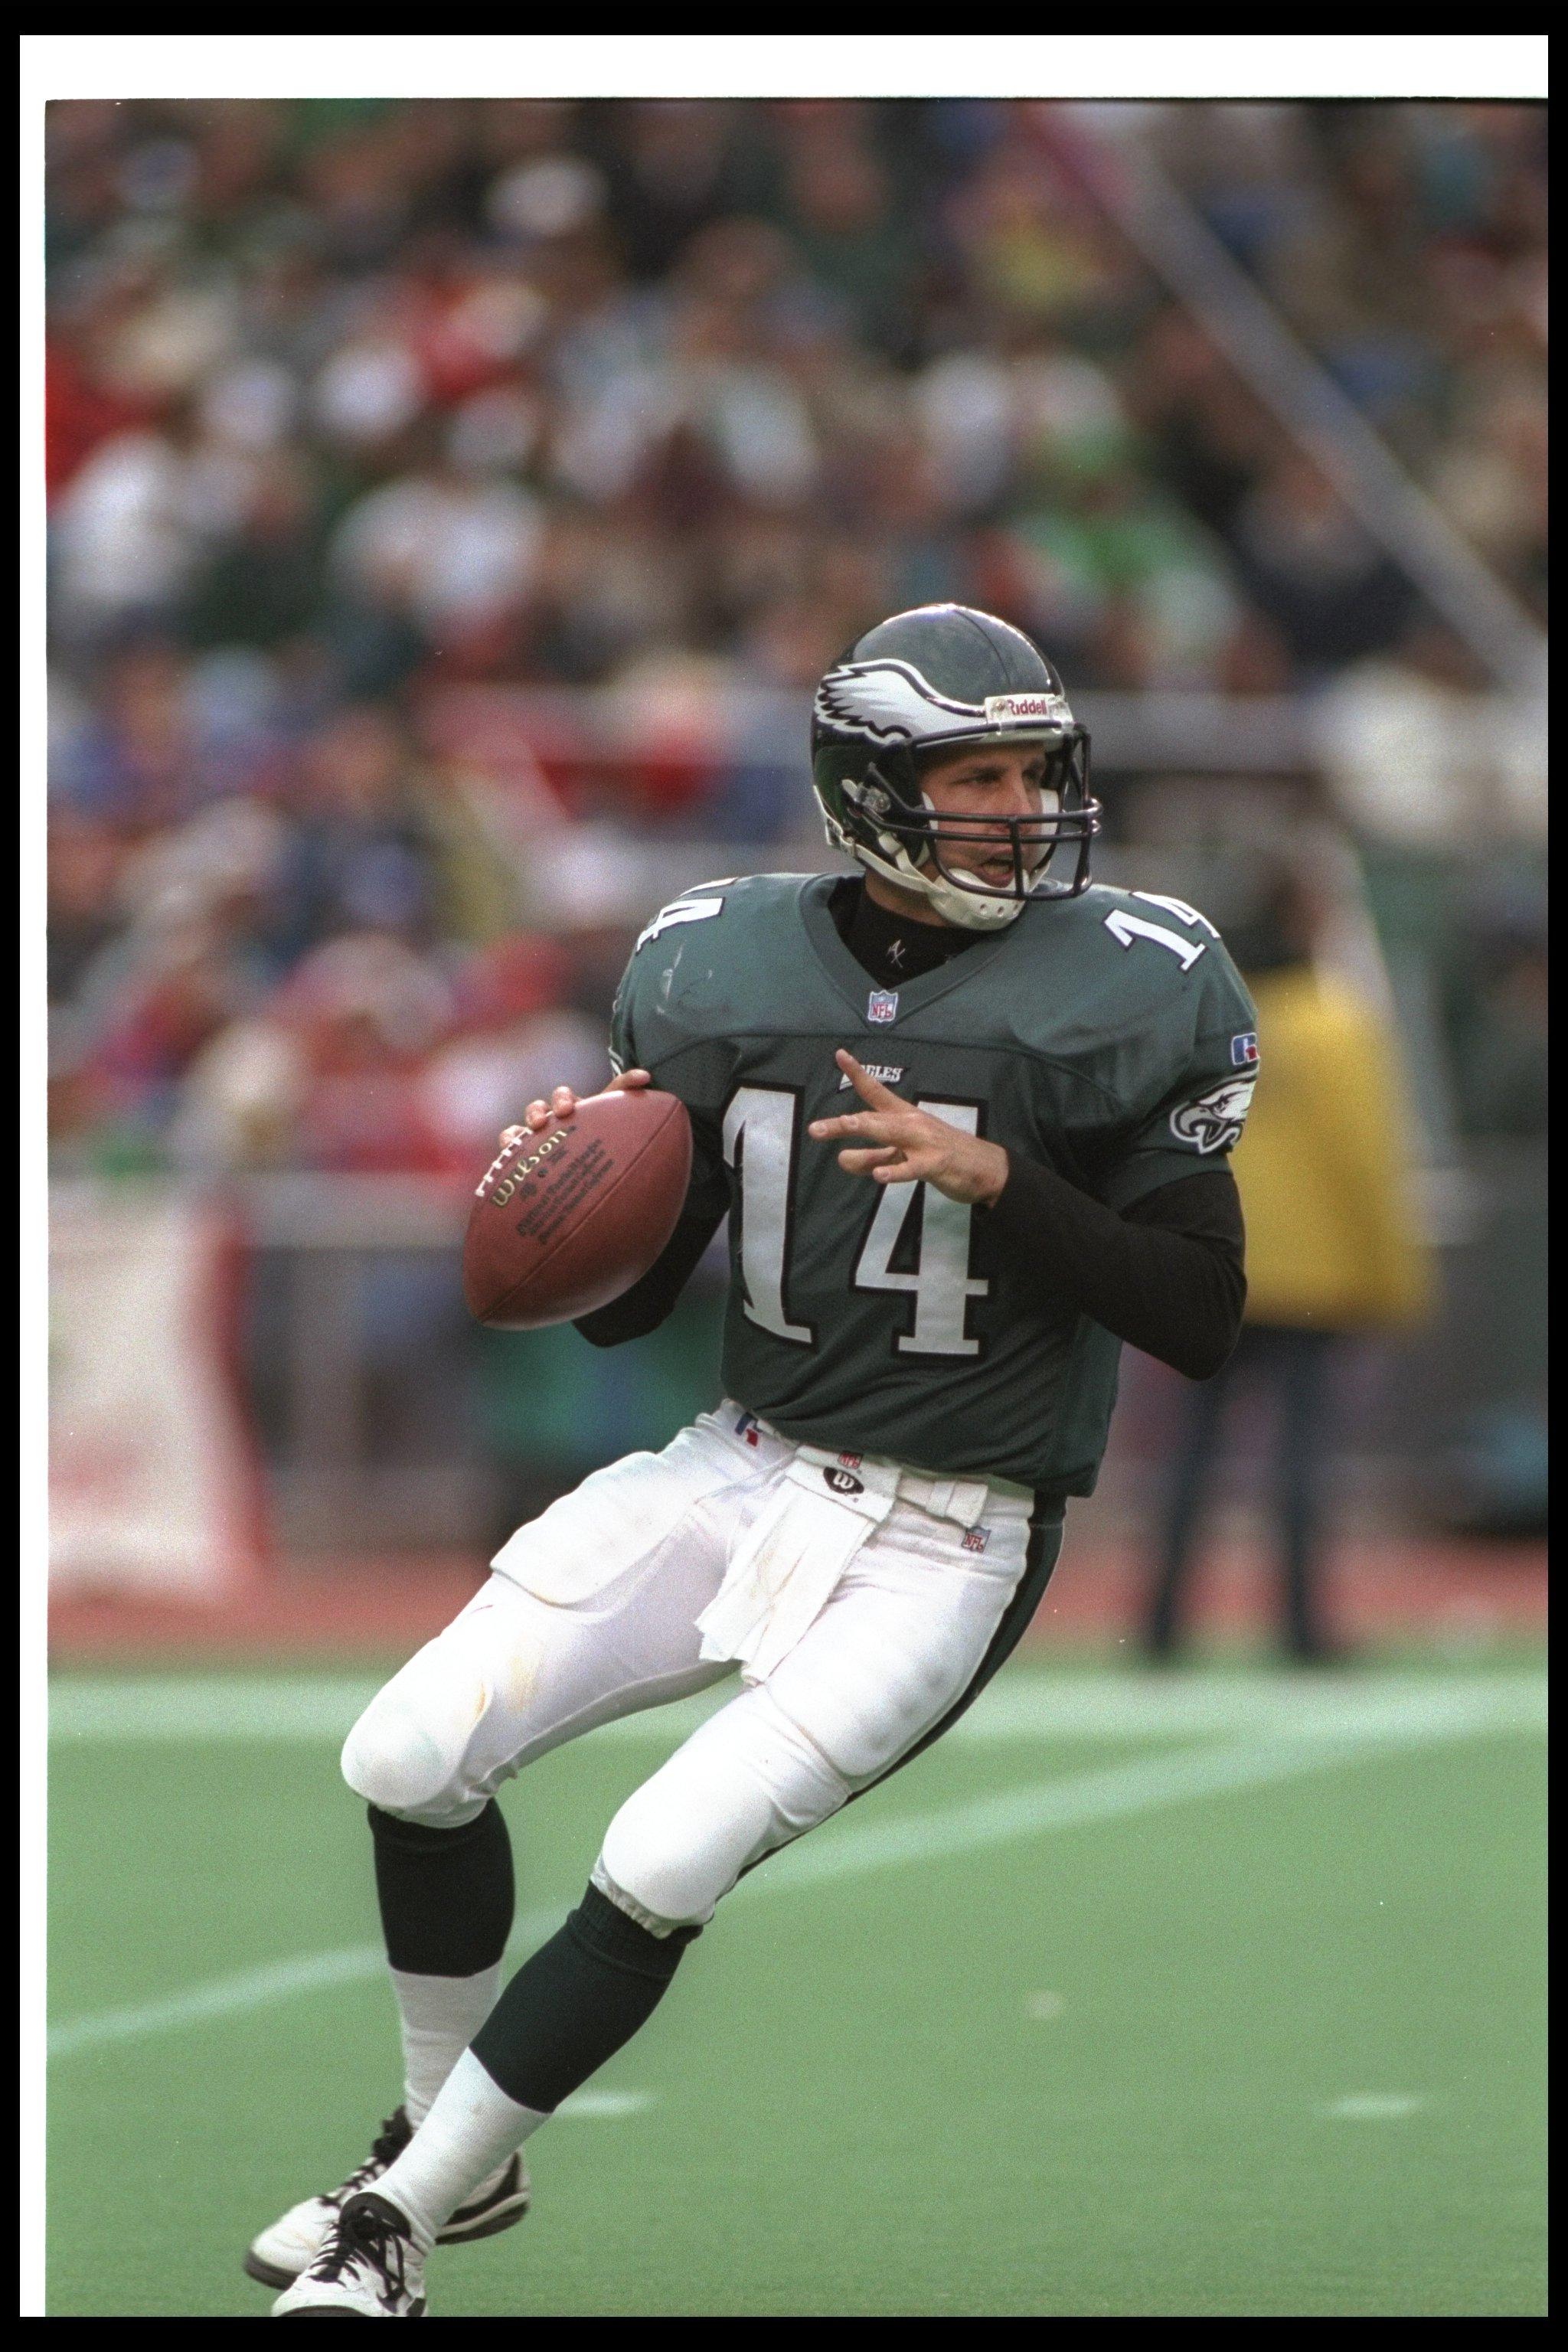 ea546556915 10 Nov 1996: Quarterback Ty Detmer of the Philadelphia Eagles looks to pass  the ball